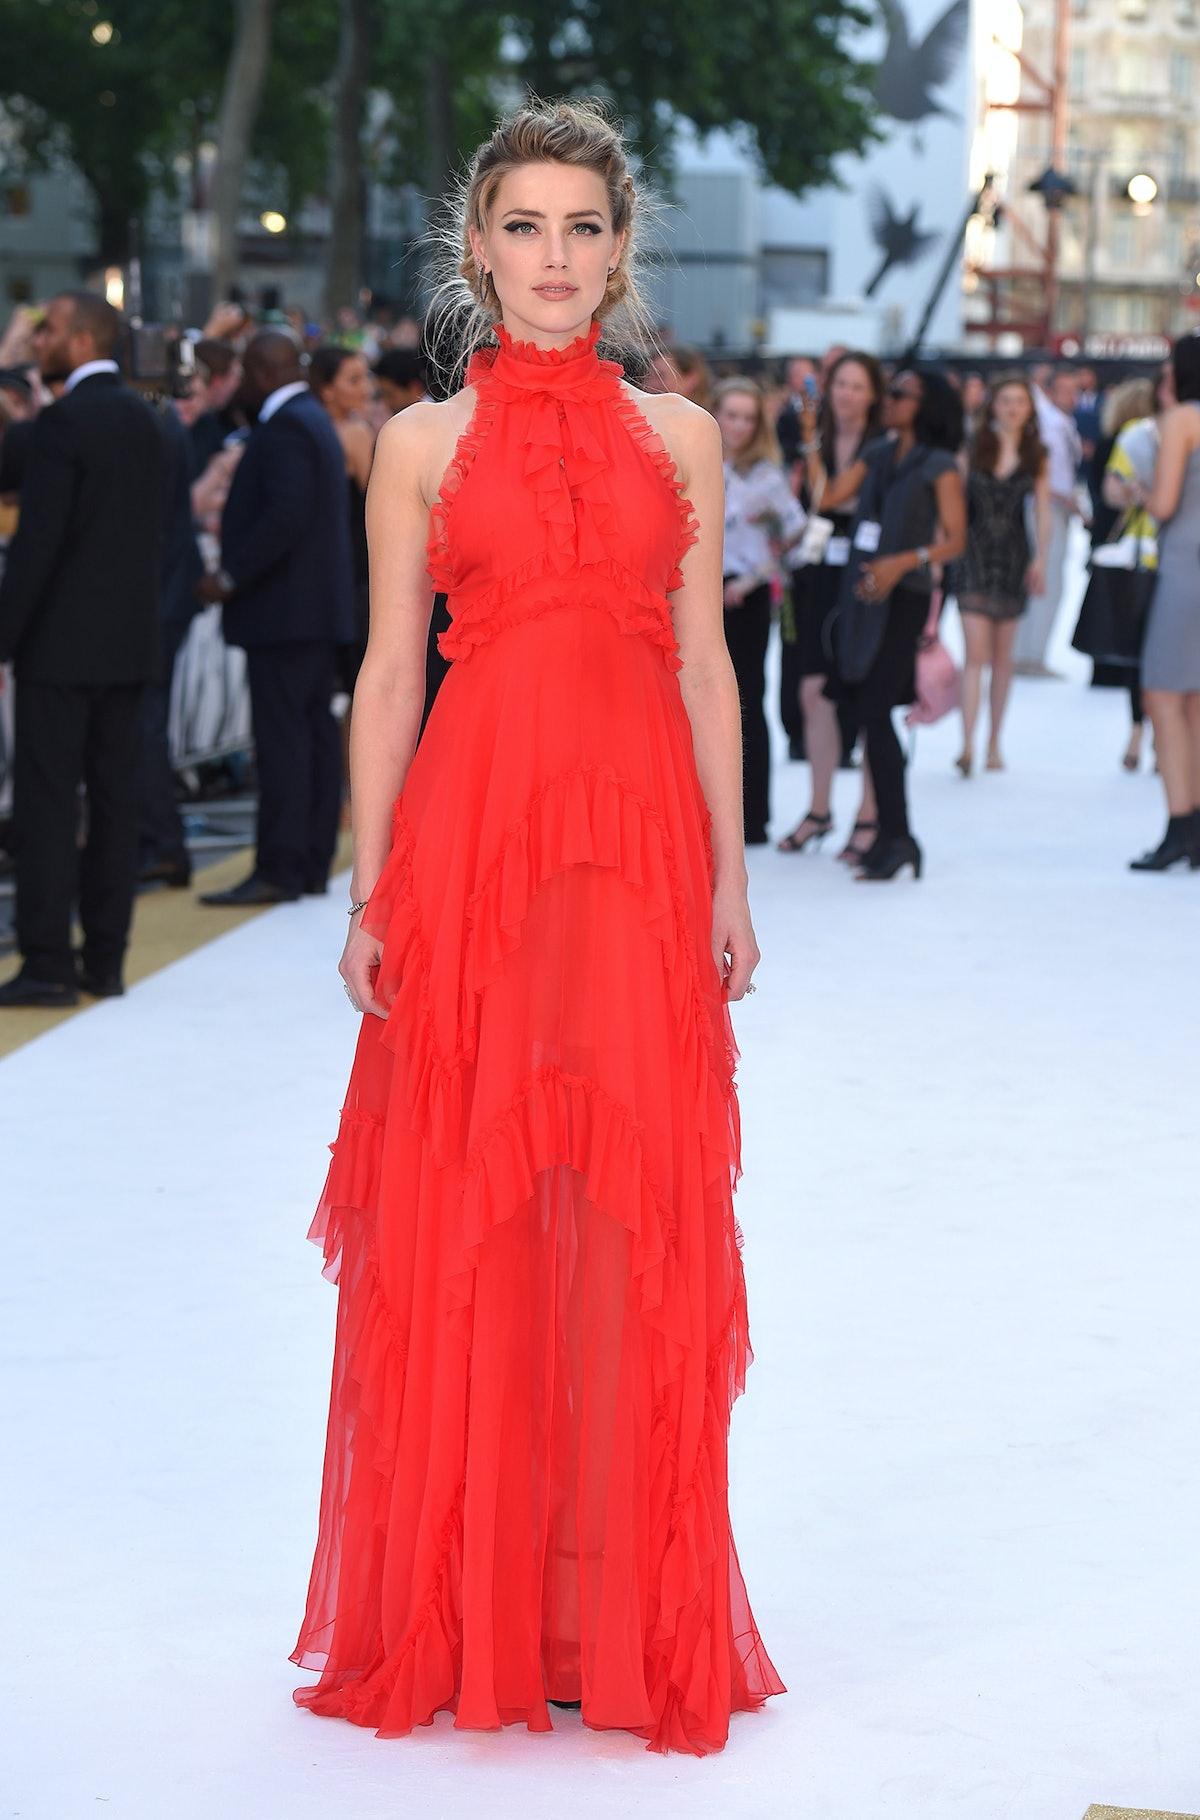 amber-heard-red-carpet-style-1